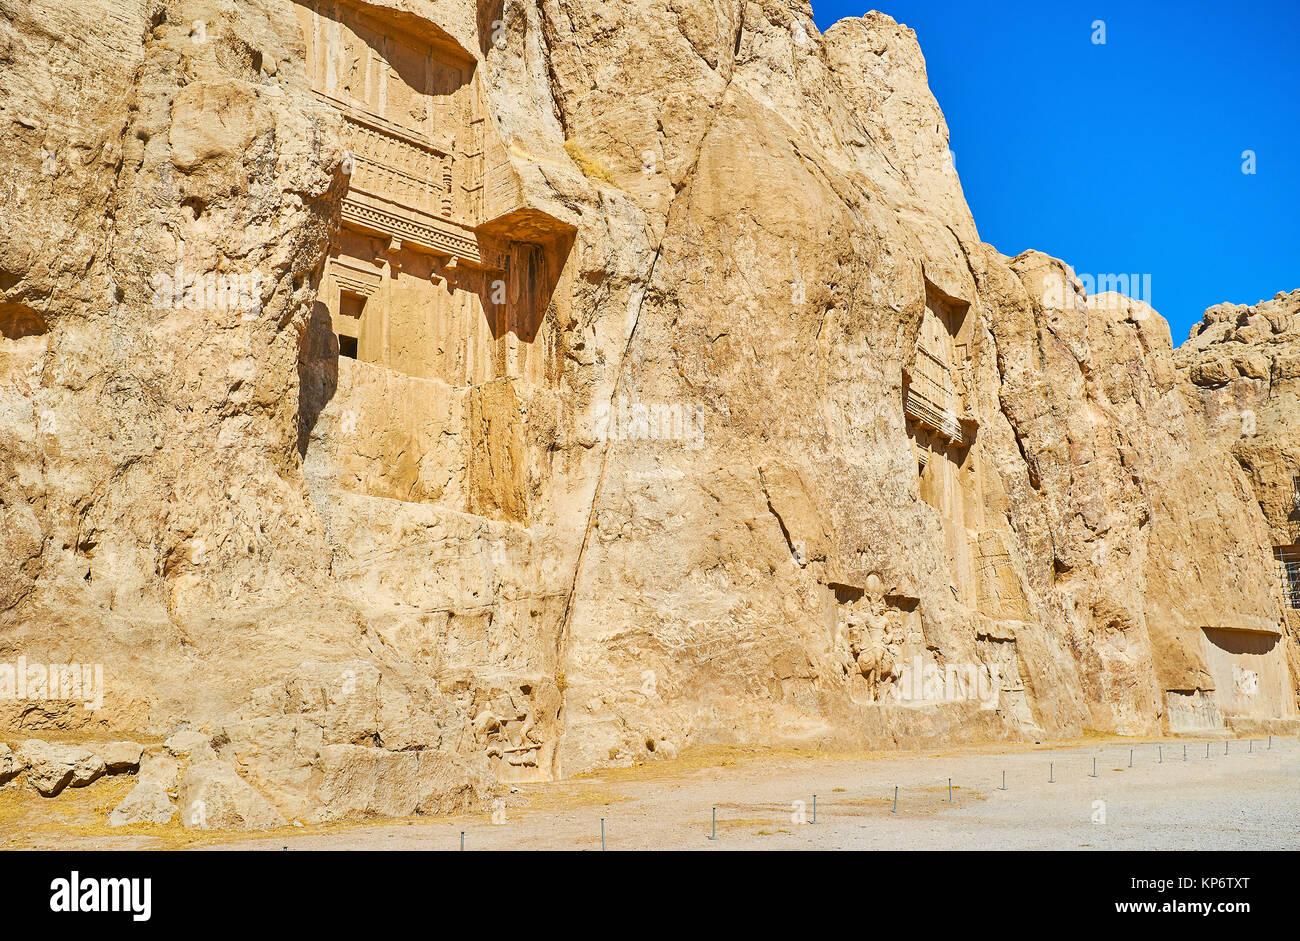 La roche massive avec mausolées sculptés dans la nécropole de Naqsh-e Rustam, Iran. Photo Stock